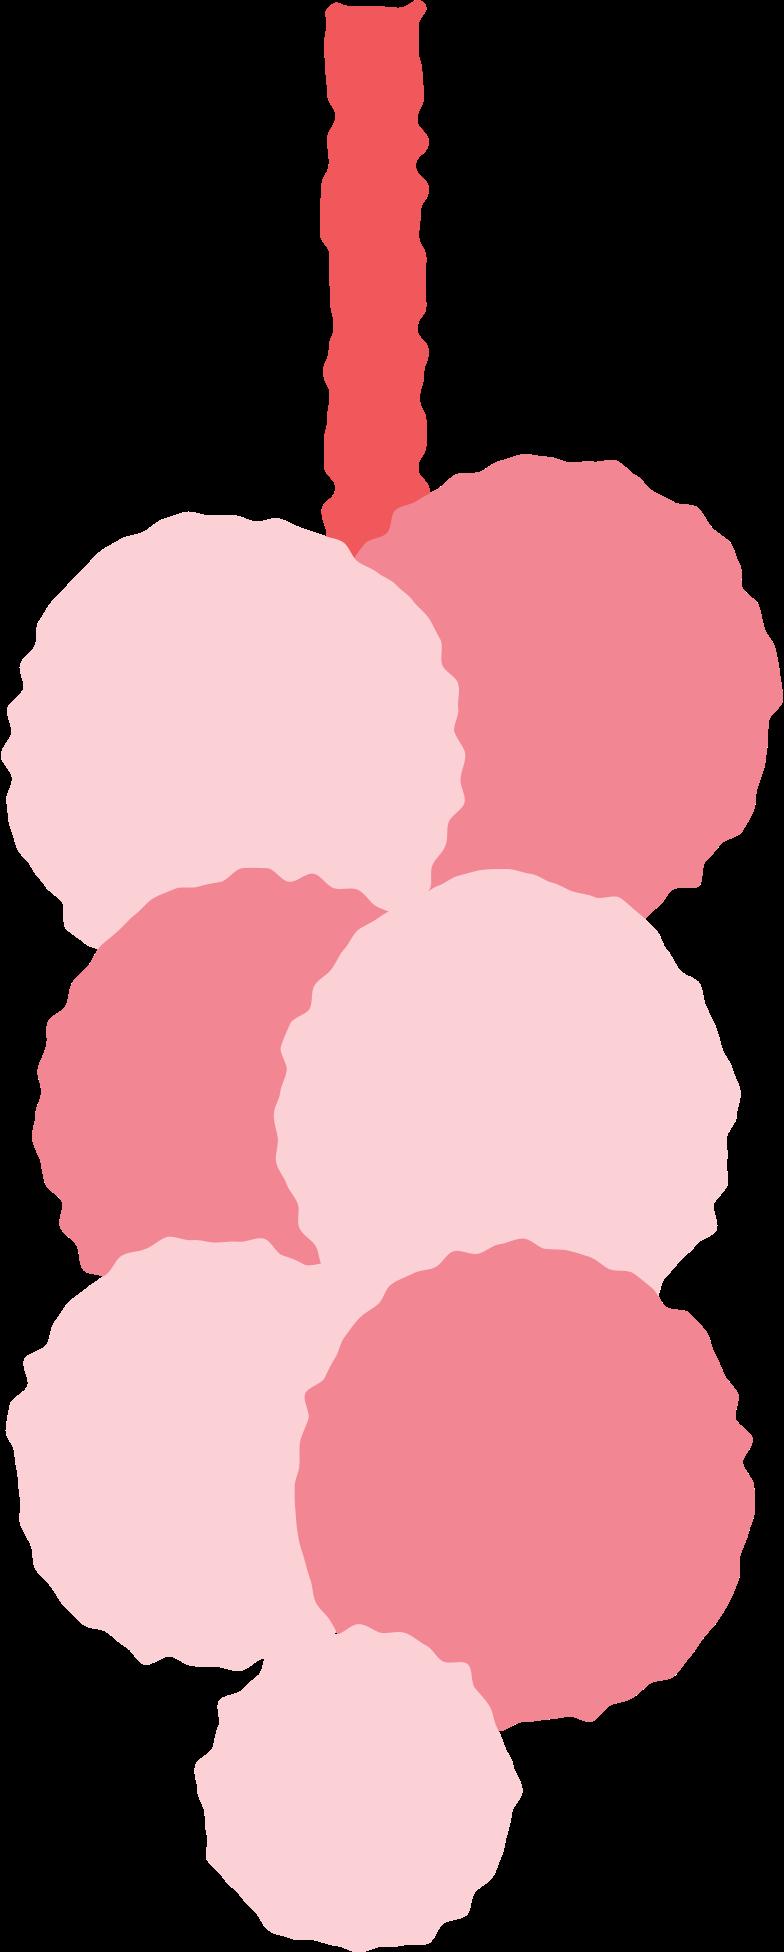 garlic Clipart illustration in PNG, SVG